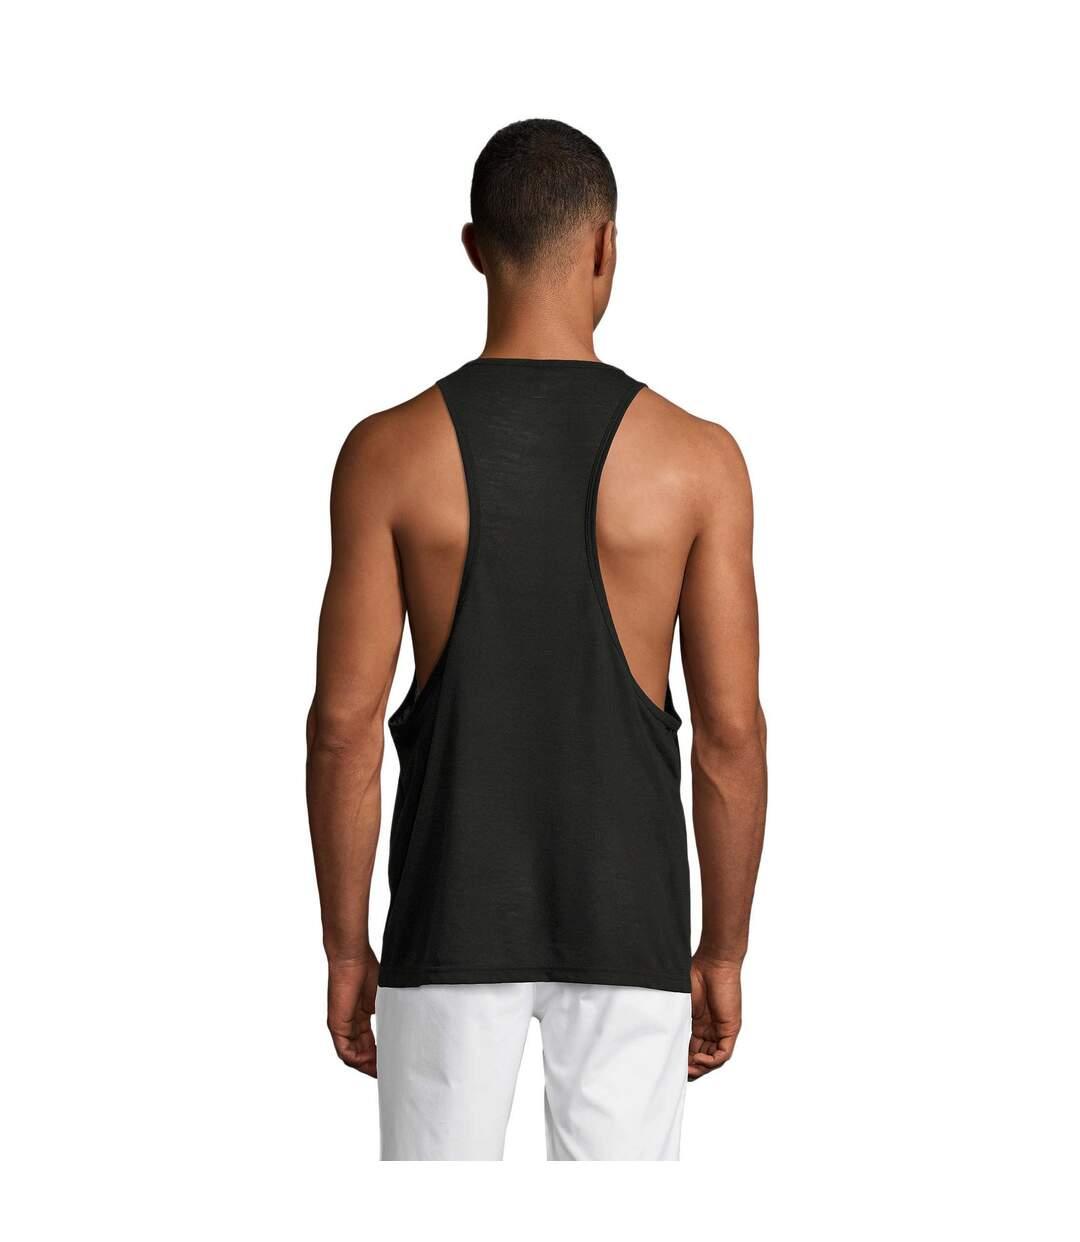 SOLS Unisex Jamaica Sleeveless Tank / Vest Top (White) - UTPC2179